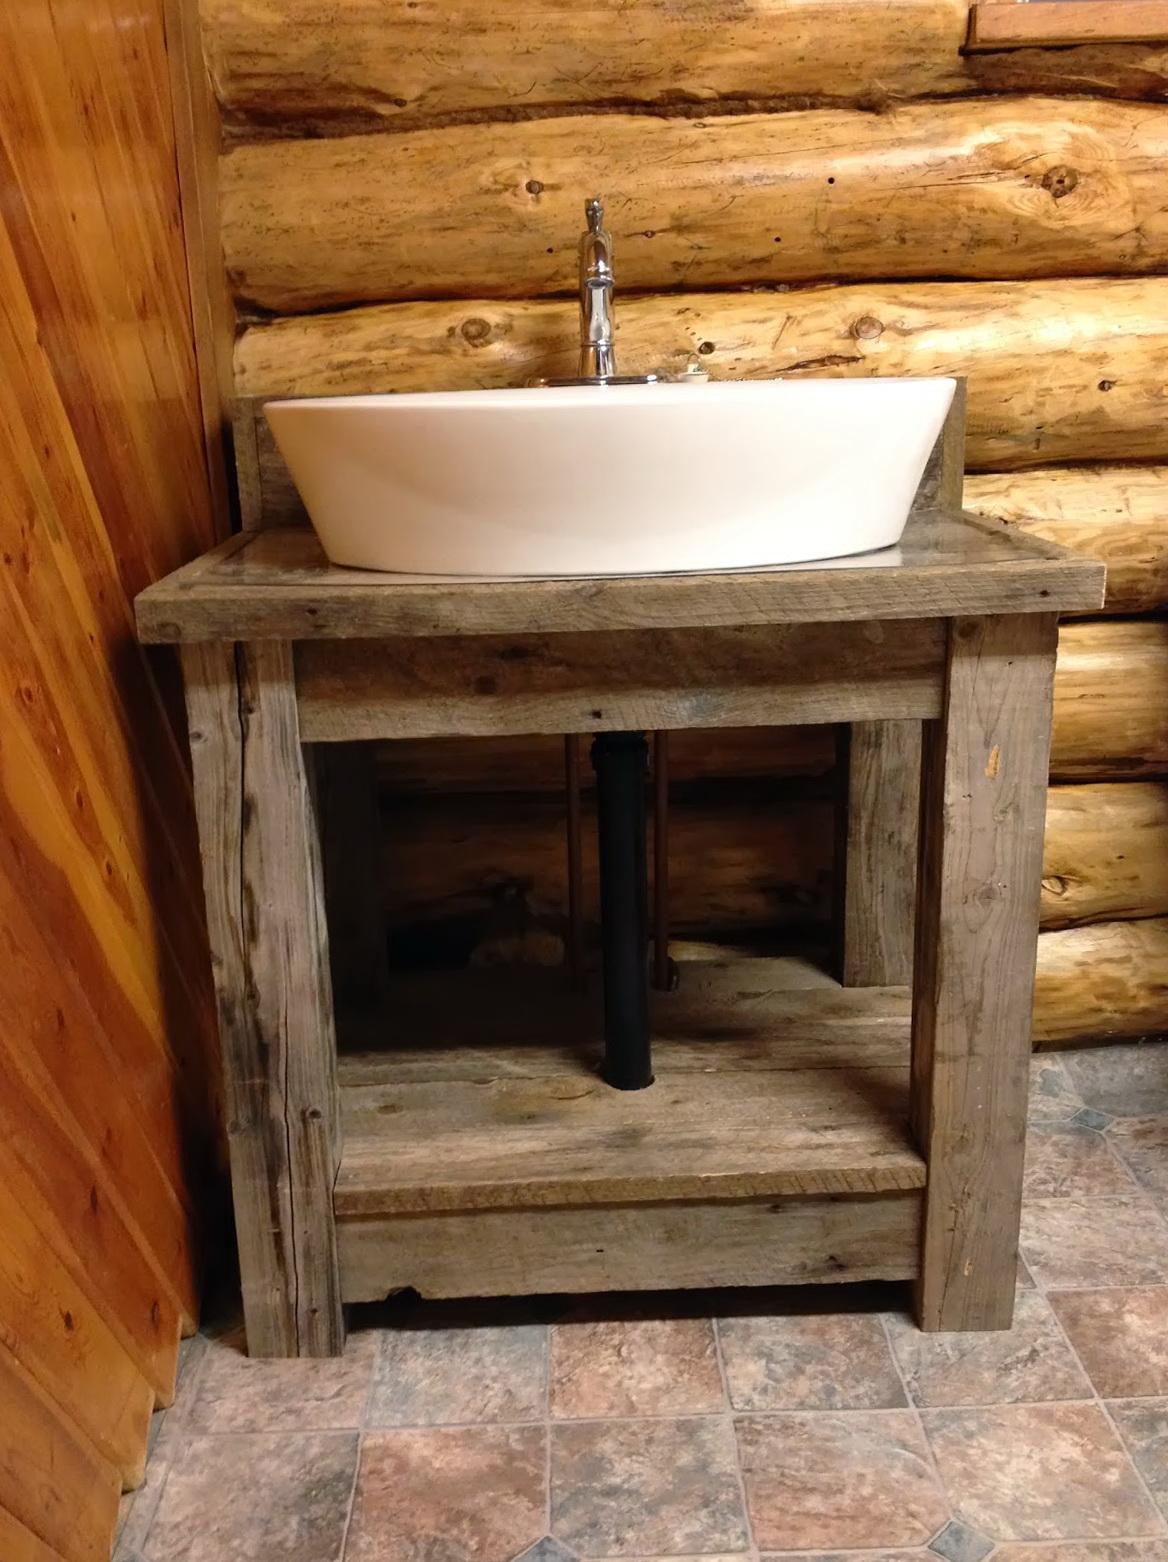 Rustic bathroom vanities for sale home design ideas for Bath vanity sale